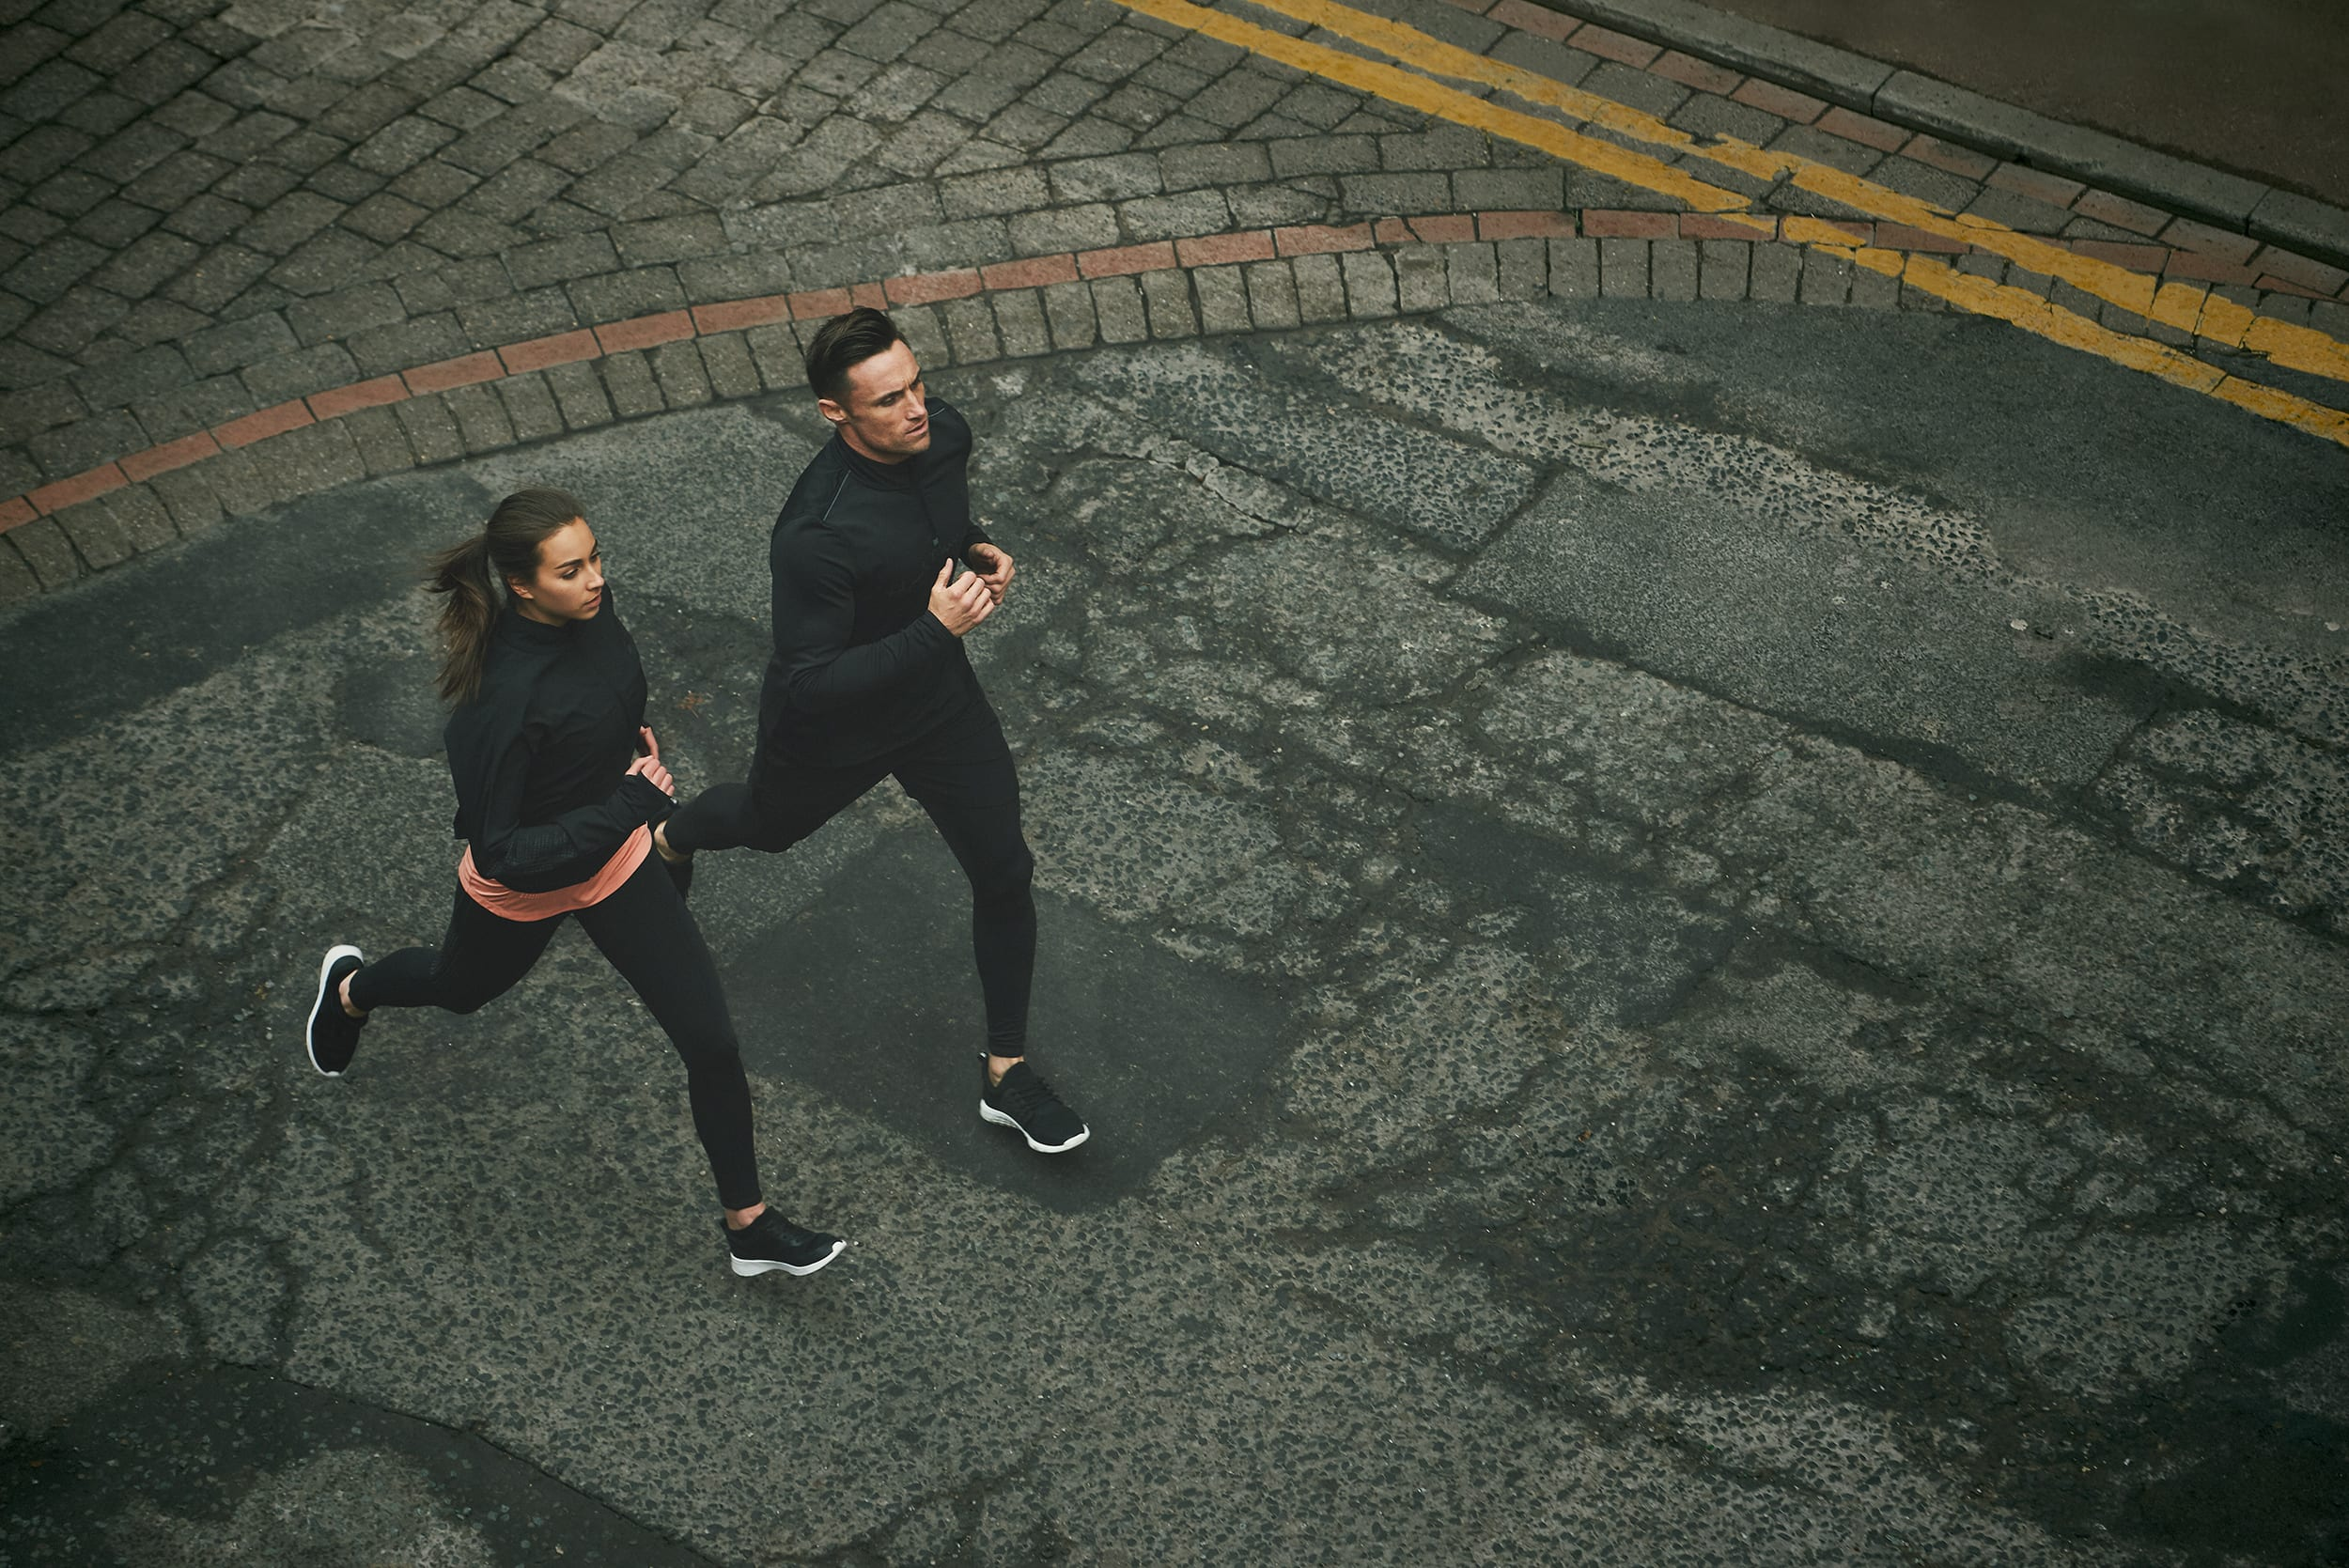 sport partner samen sporten